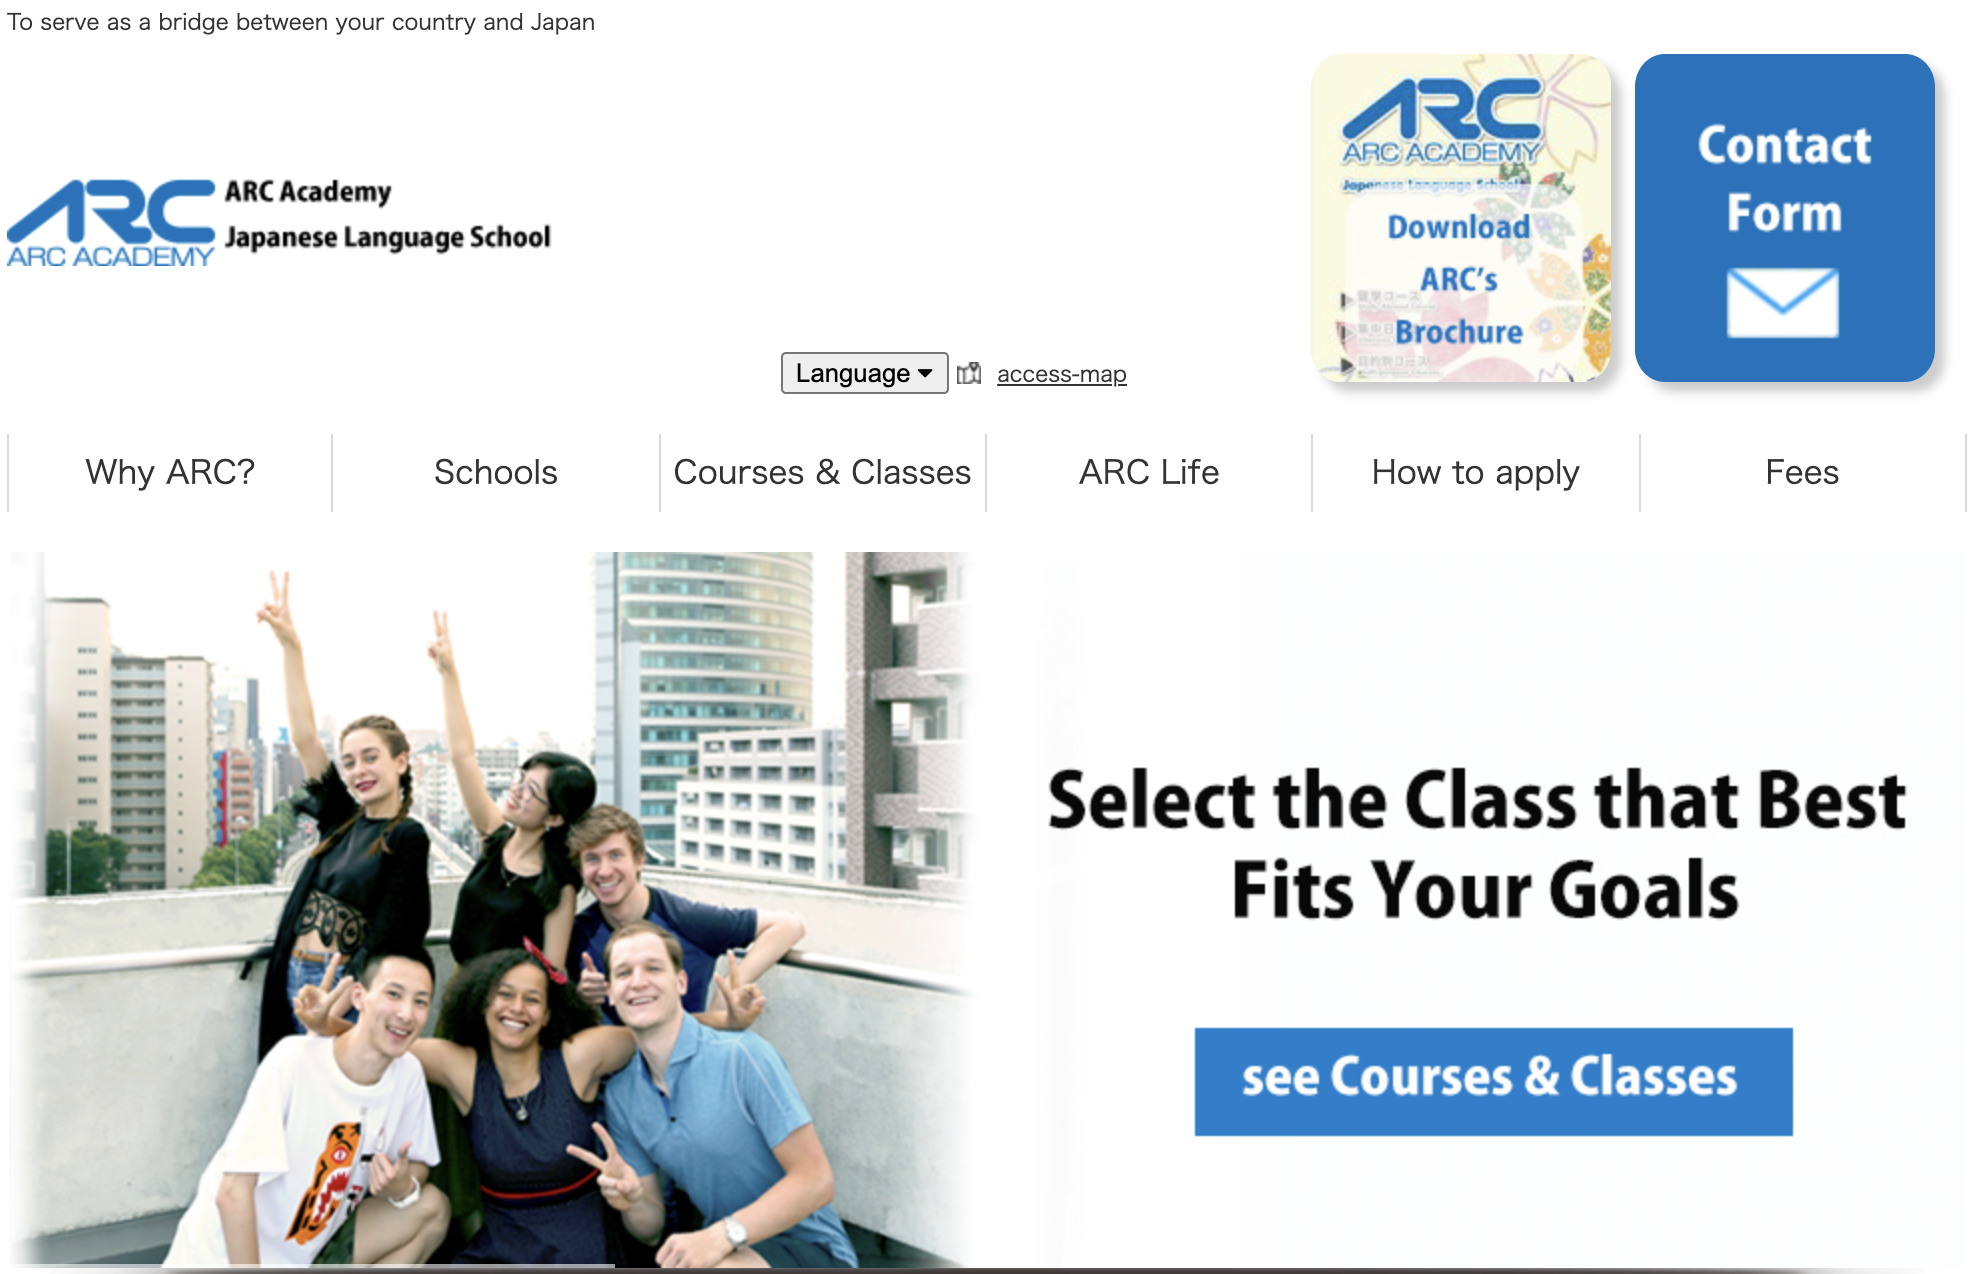 ARC Academy Japanese Language School